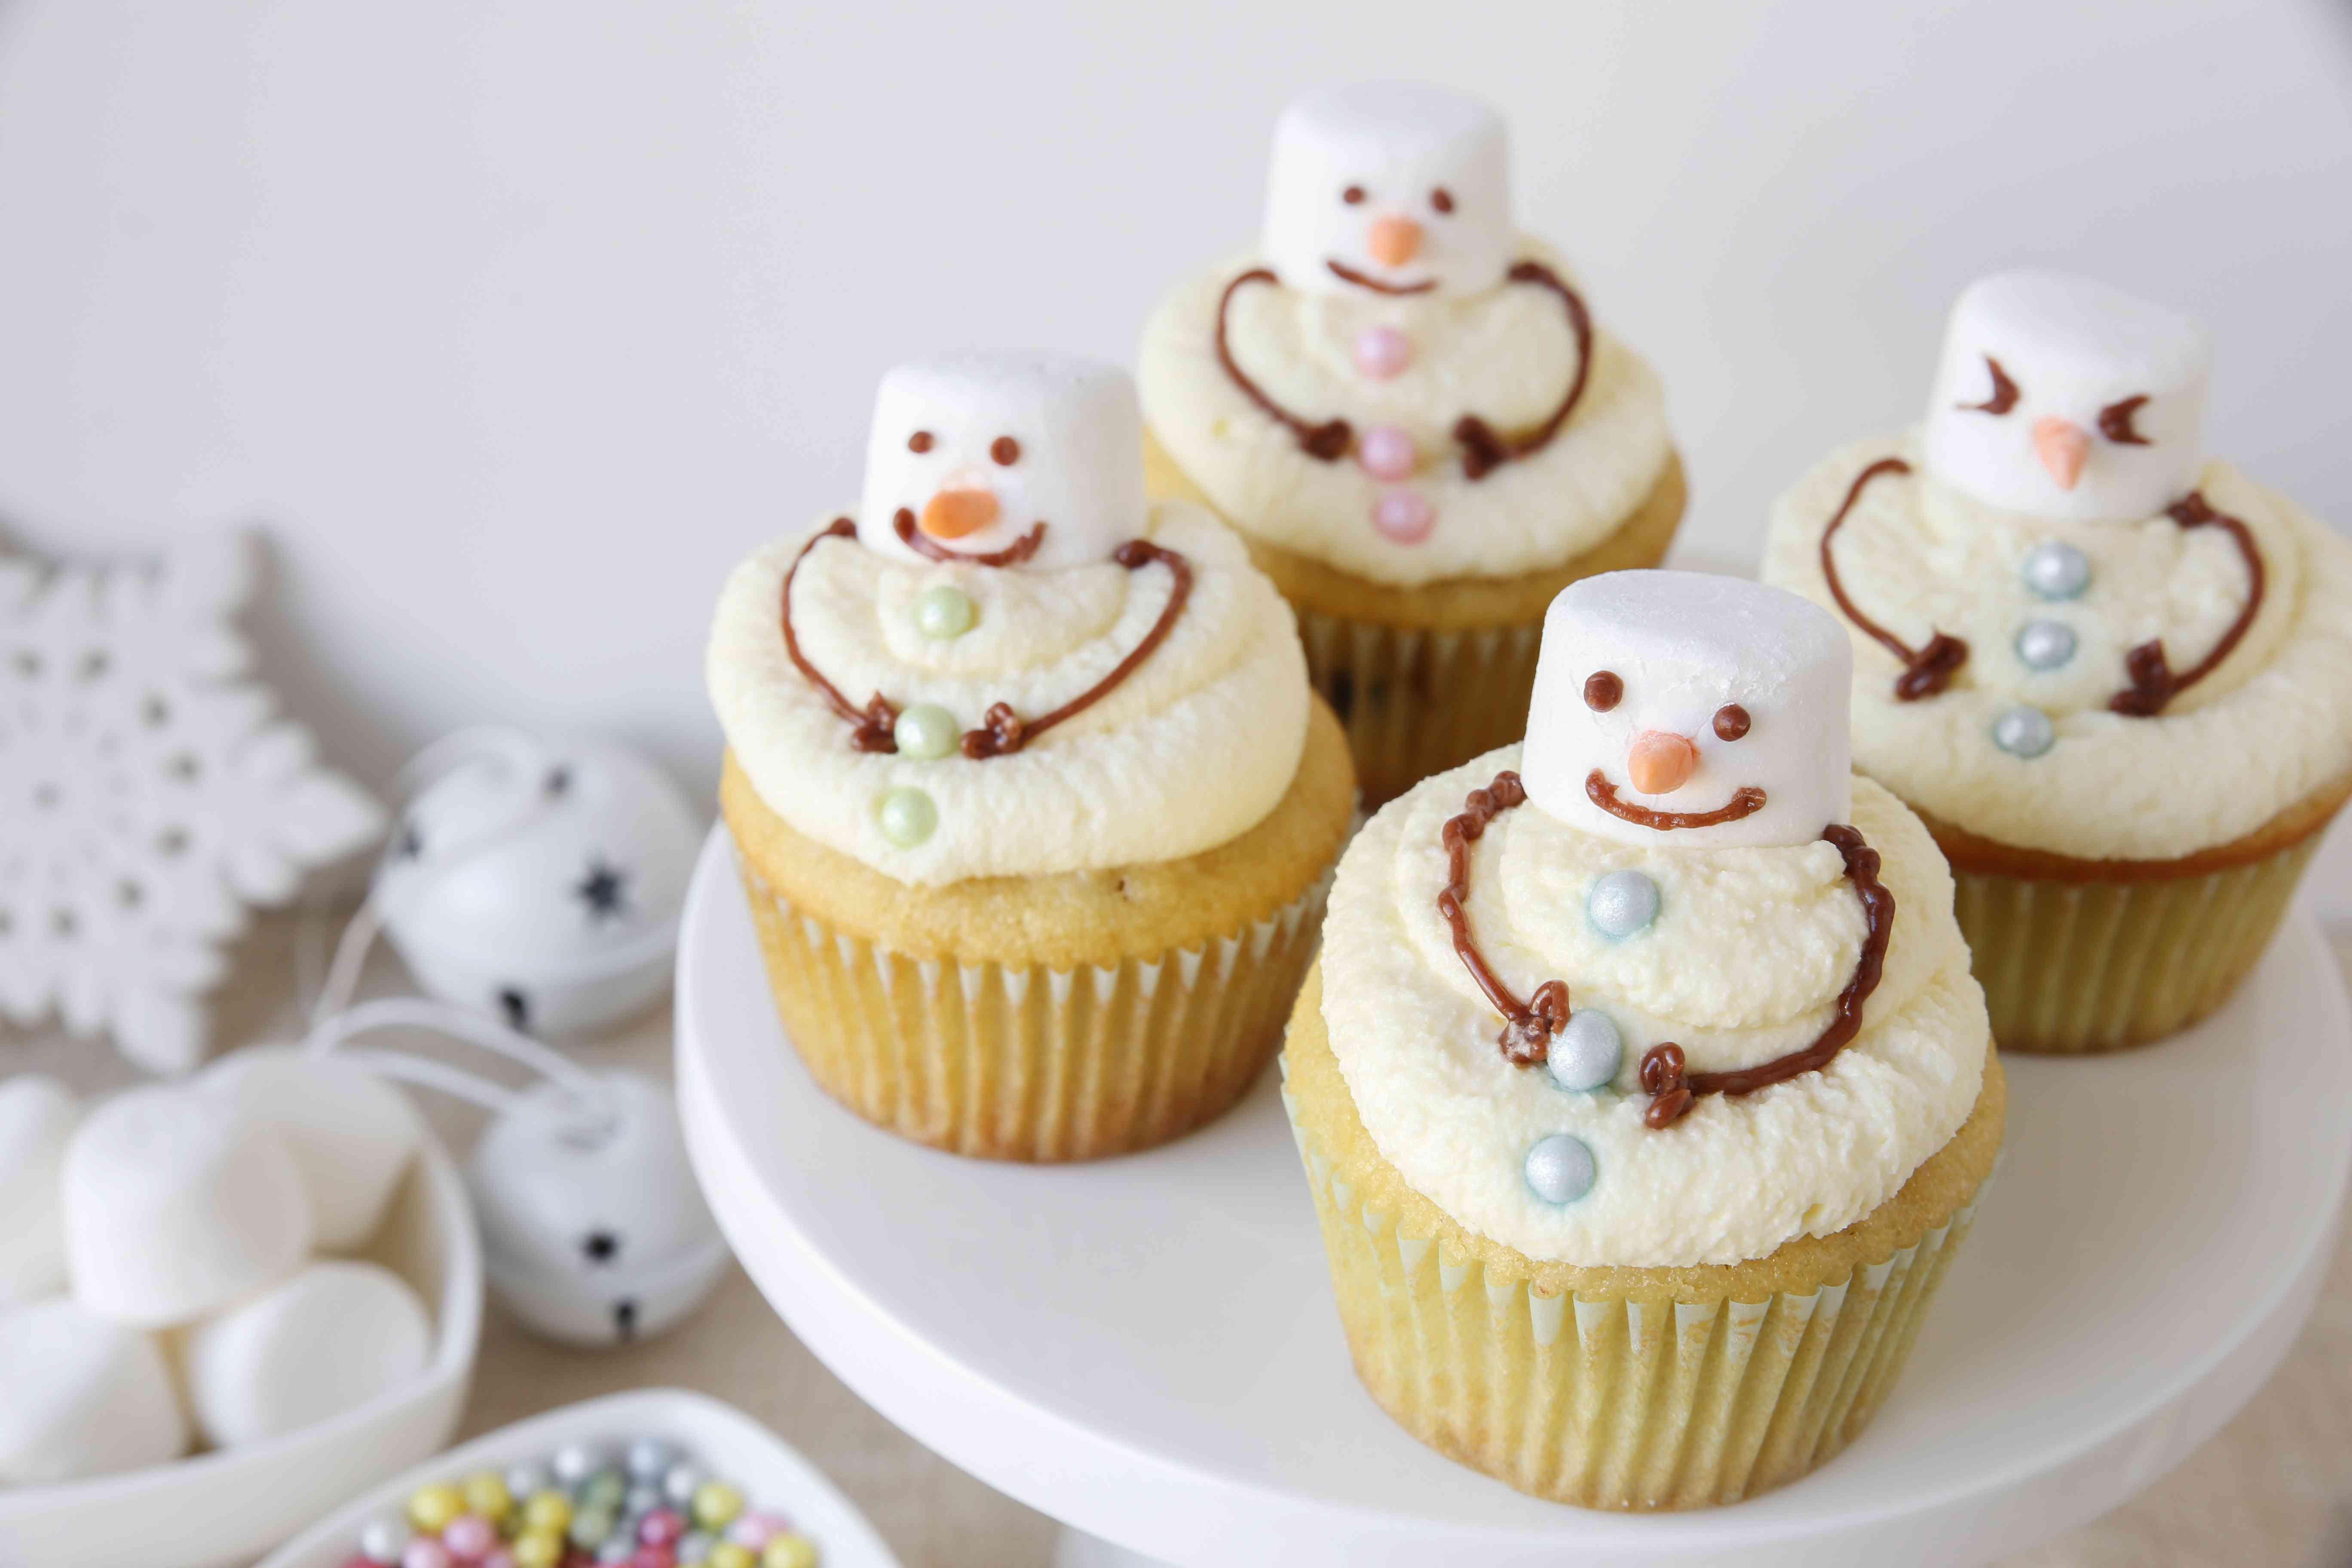 Fun homemade melting snowman cupcakes for kids